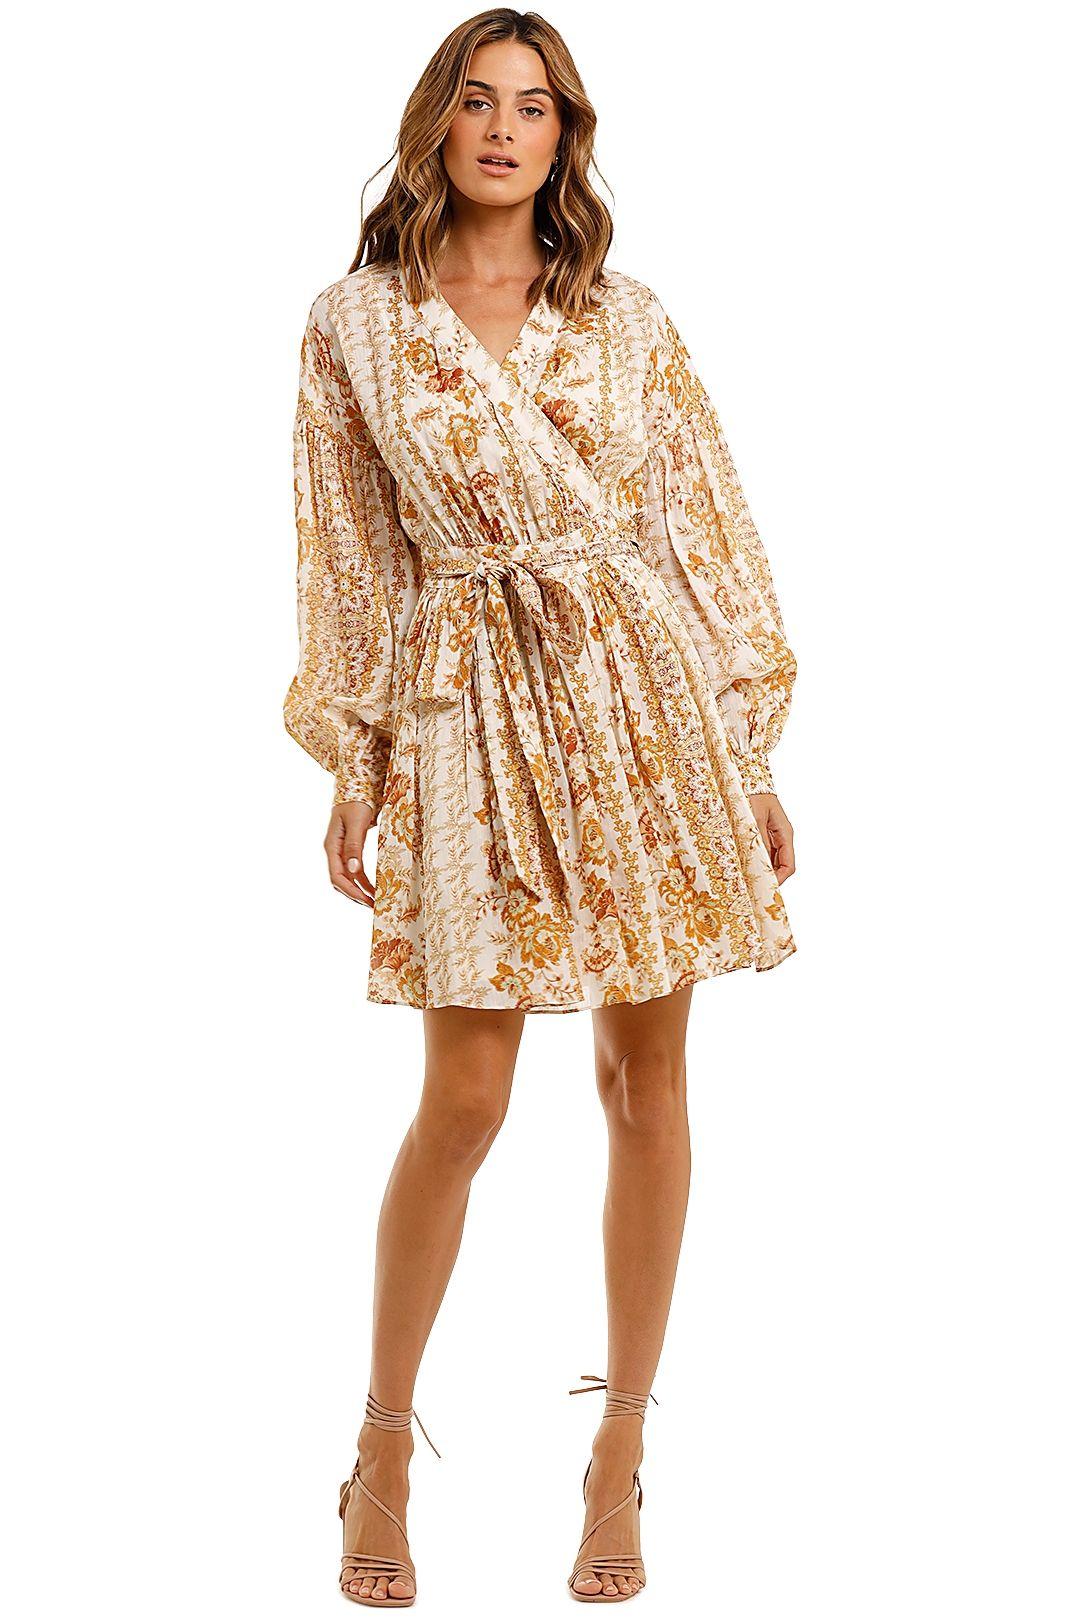 Ministry of Style Desert Daze Wrap Mini Dress Floral